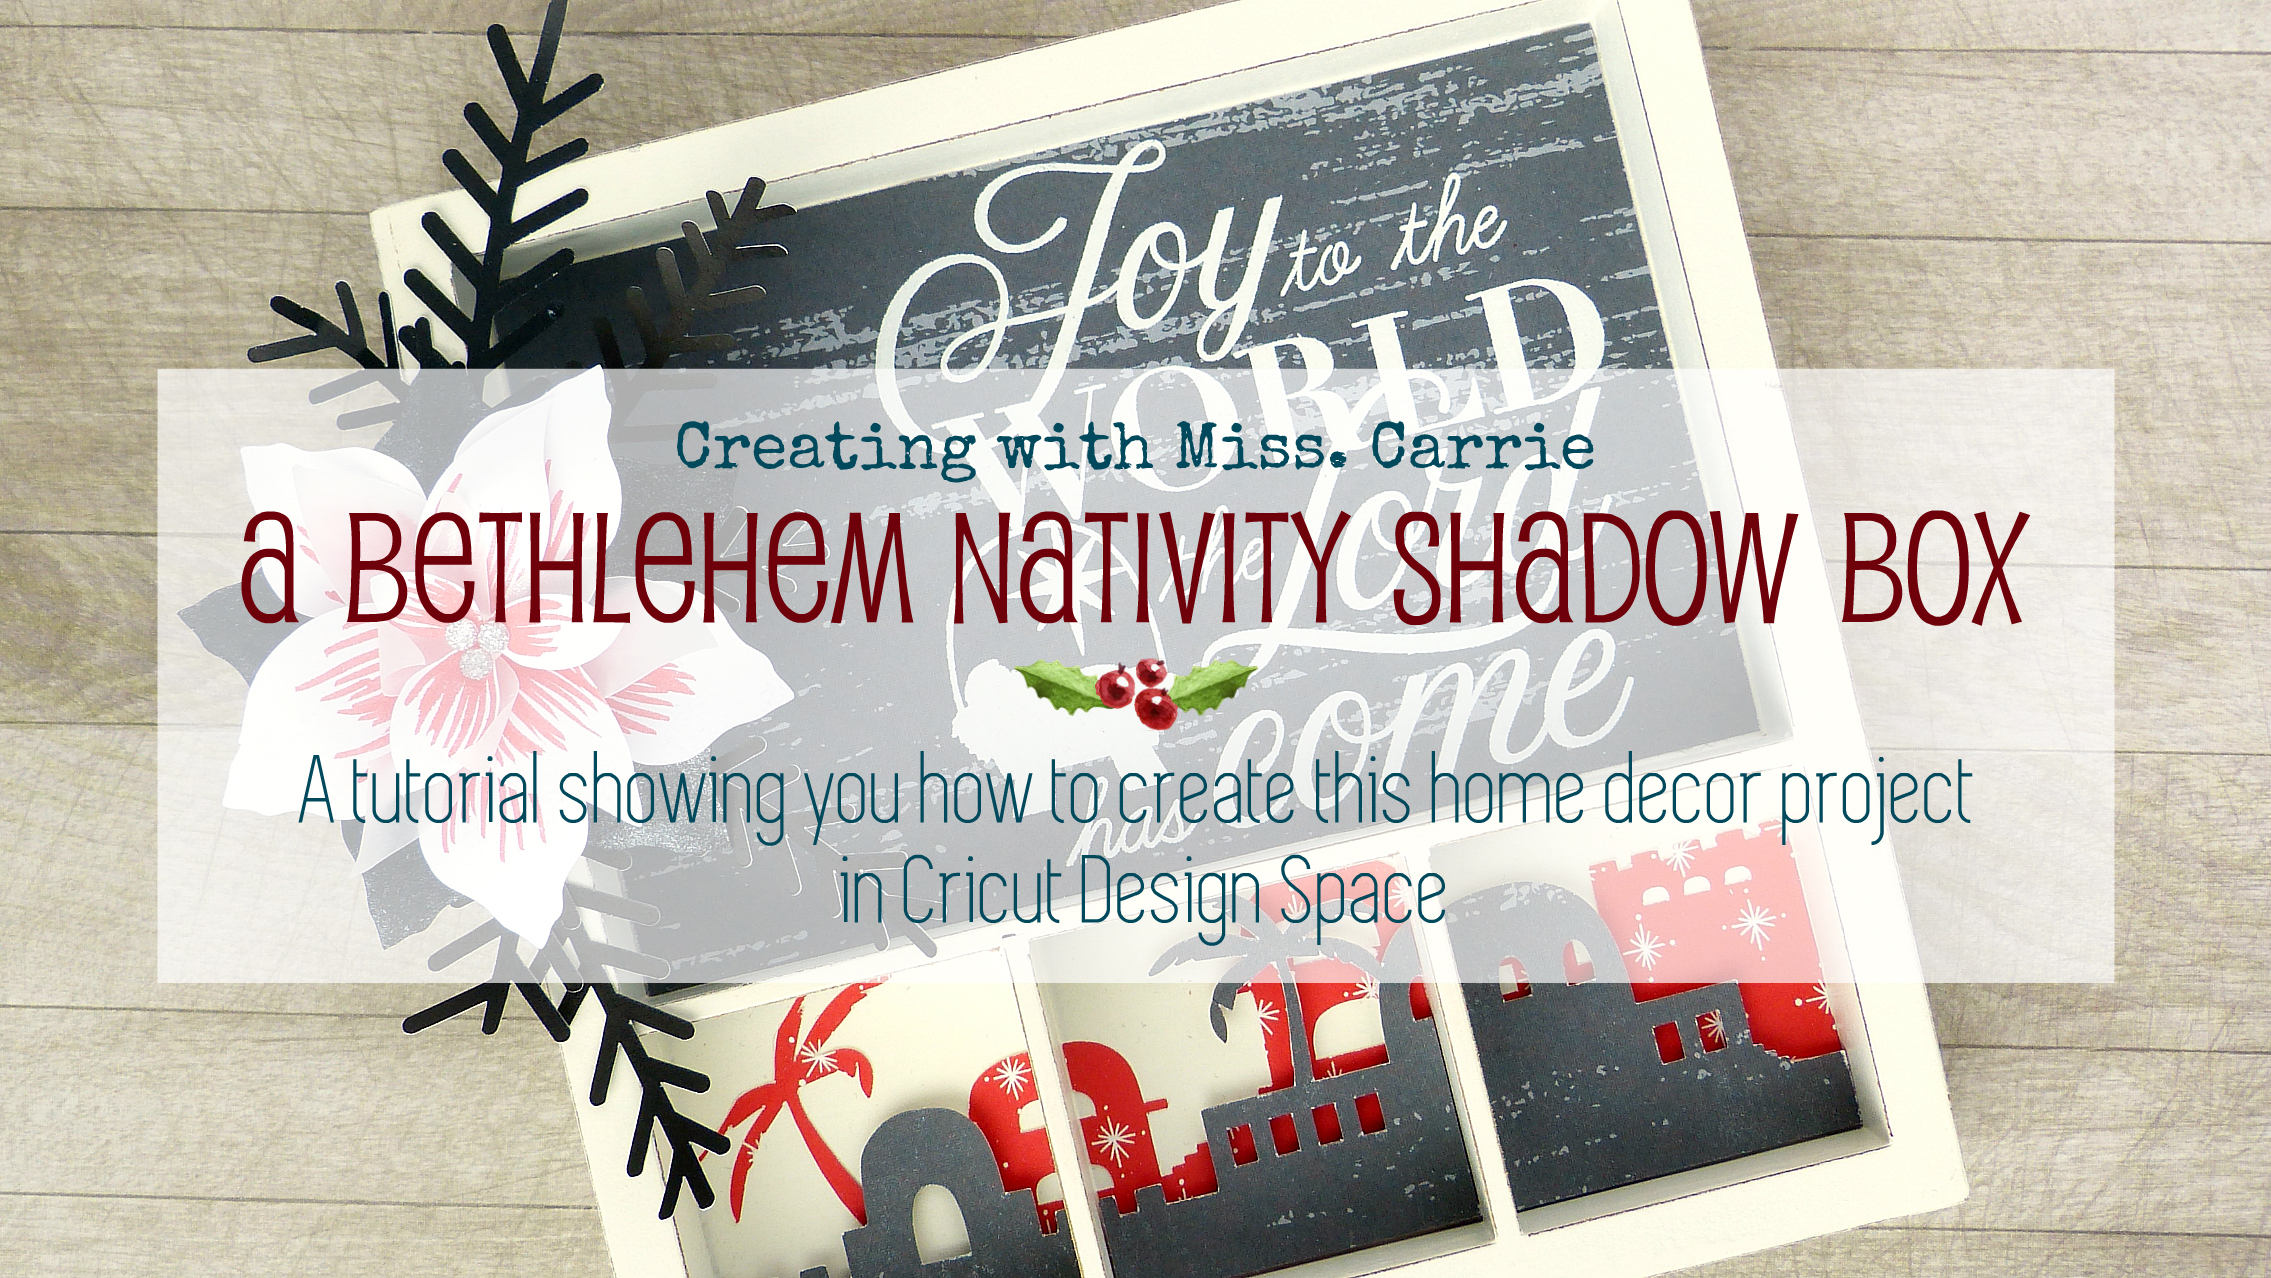 MissCarriesCreations-BethlehemNativityShadowBoxTutorial.jpg